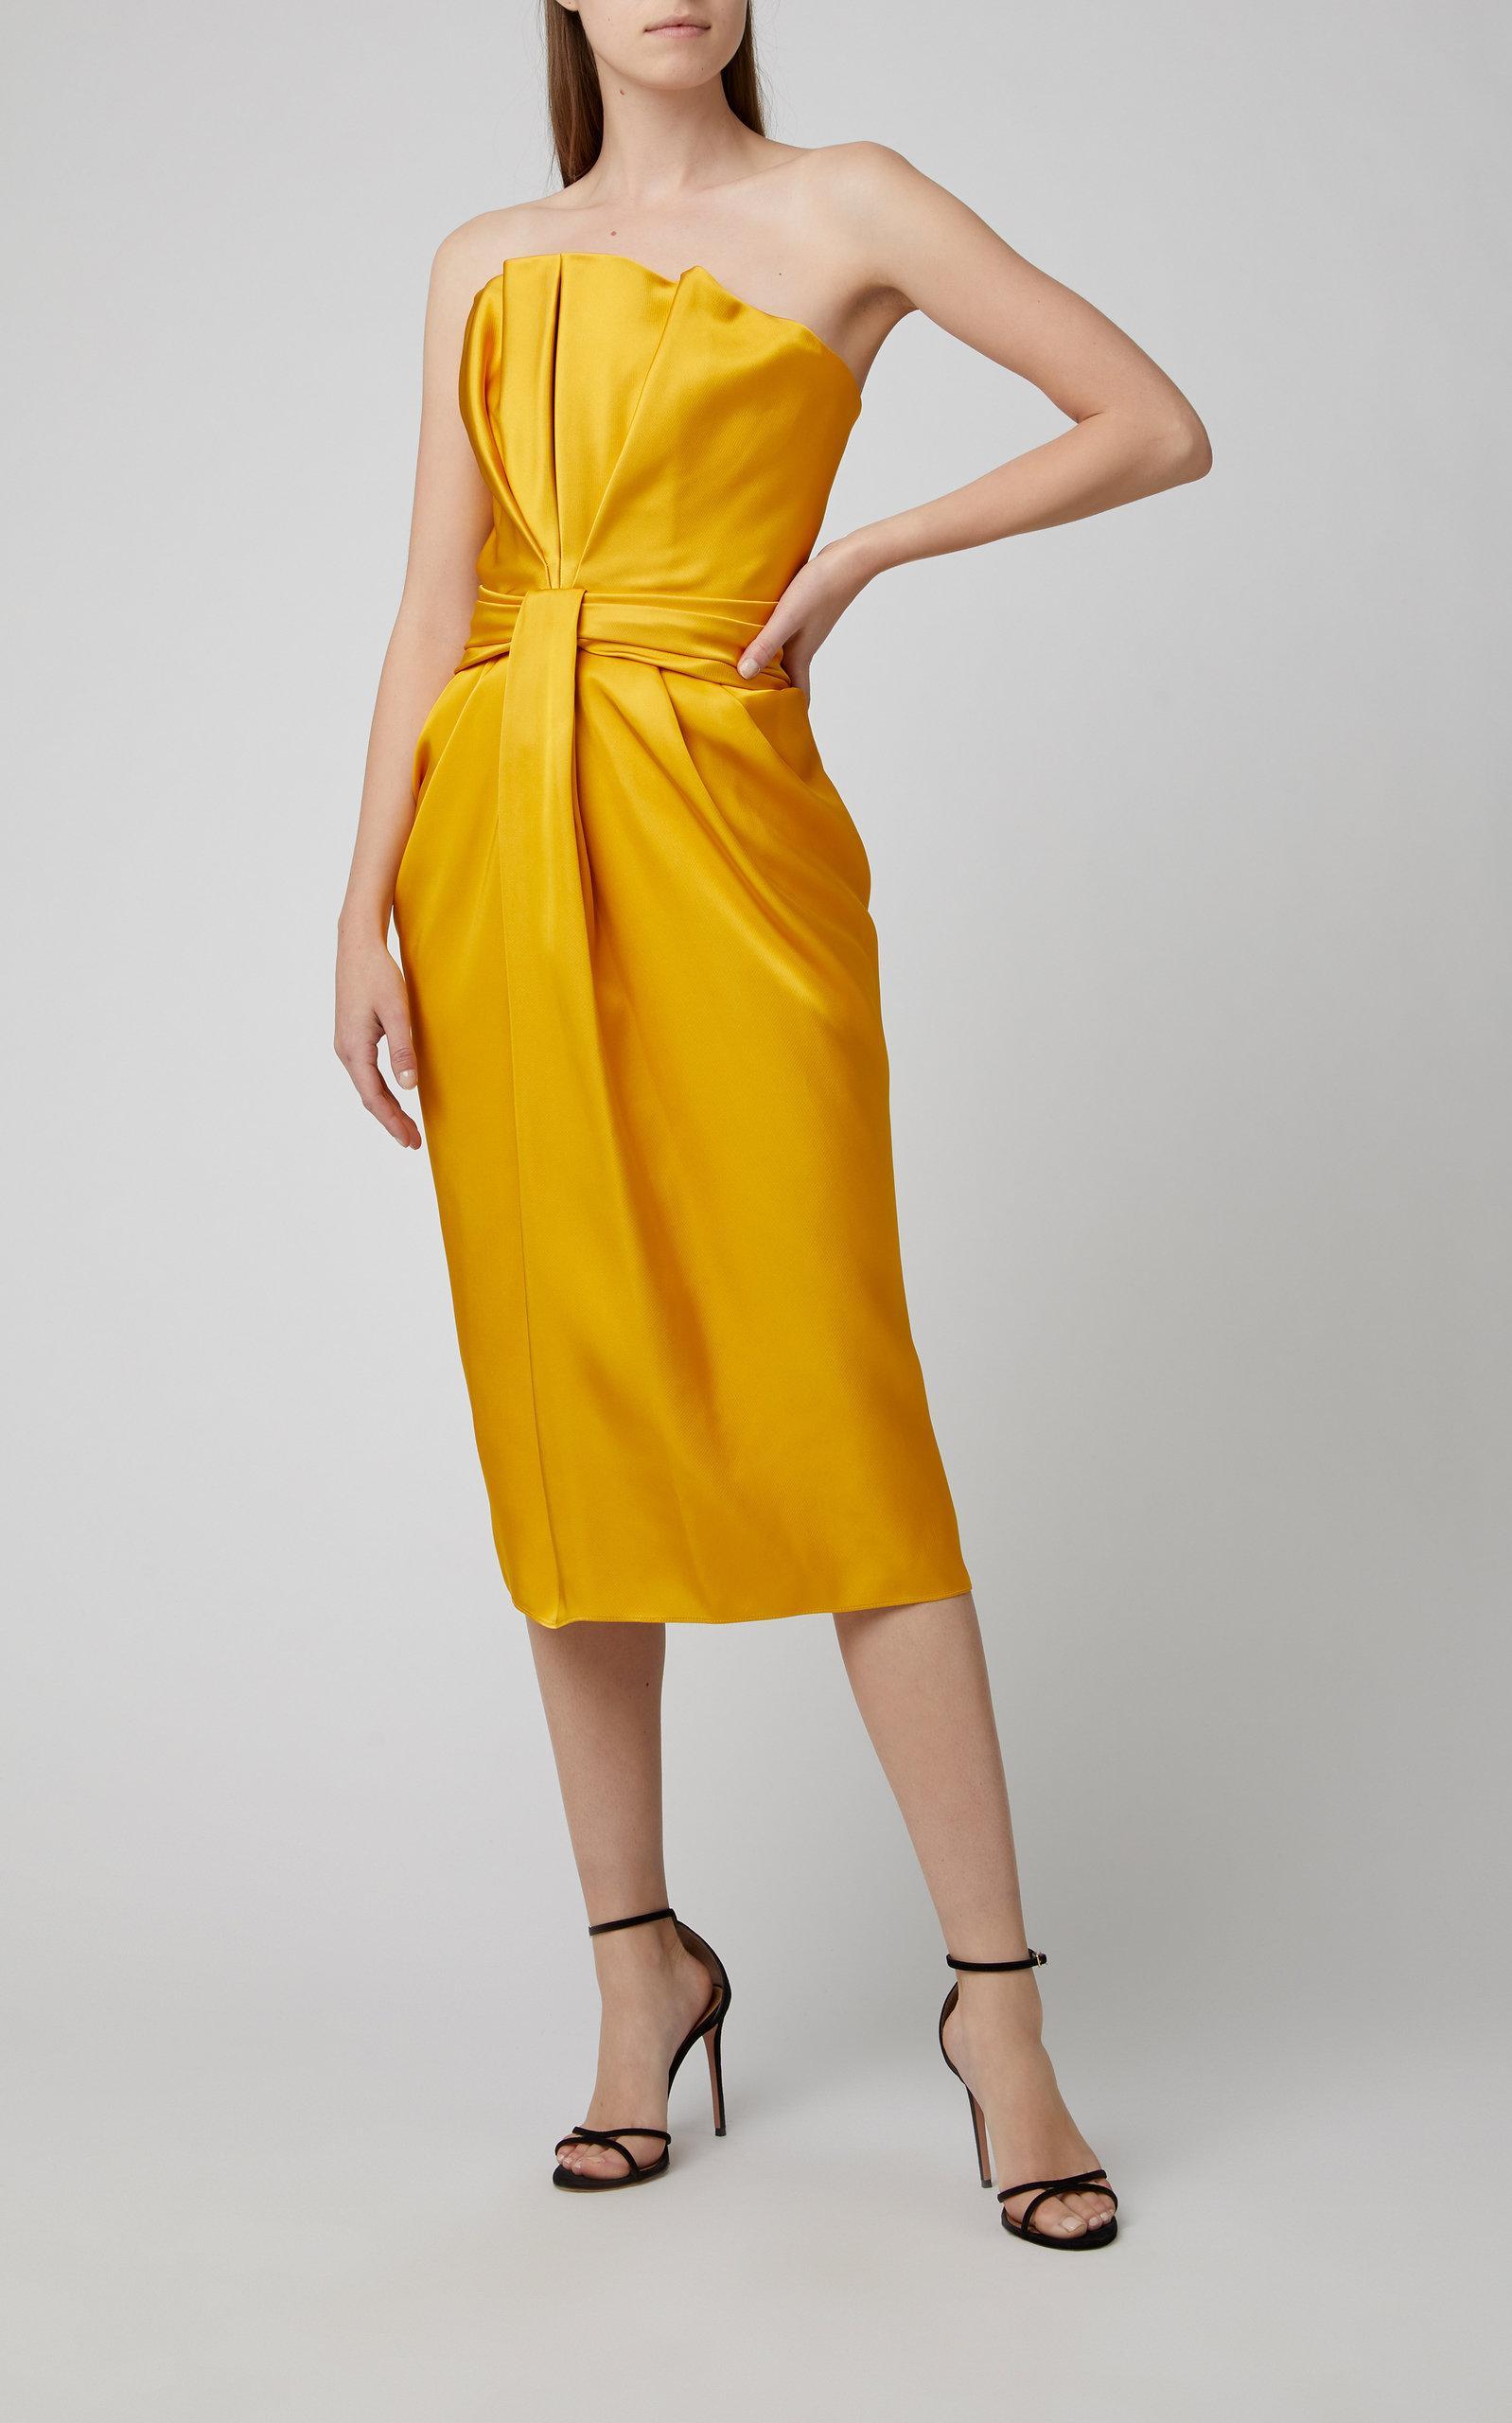 b9eaca2e5a6 Brandon Maxwell - Yellow Petal Front Satin Cocktail Dress - Lyst. View  fullscreen